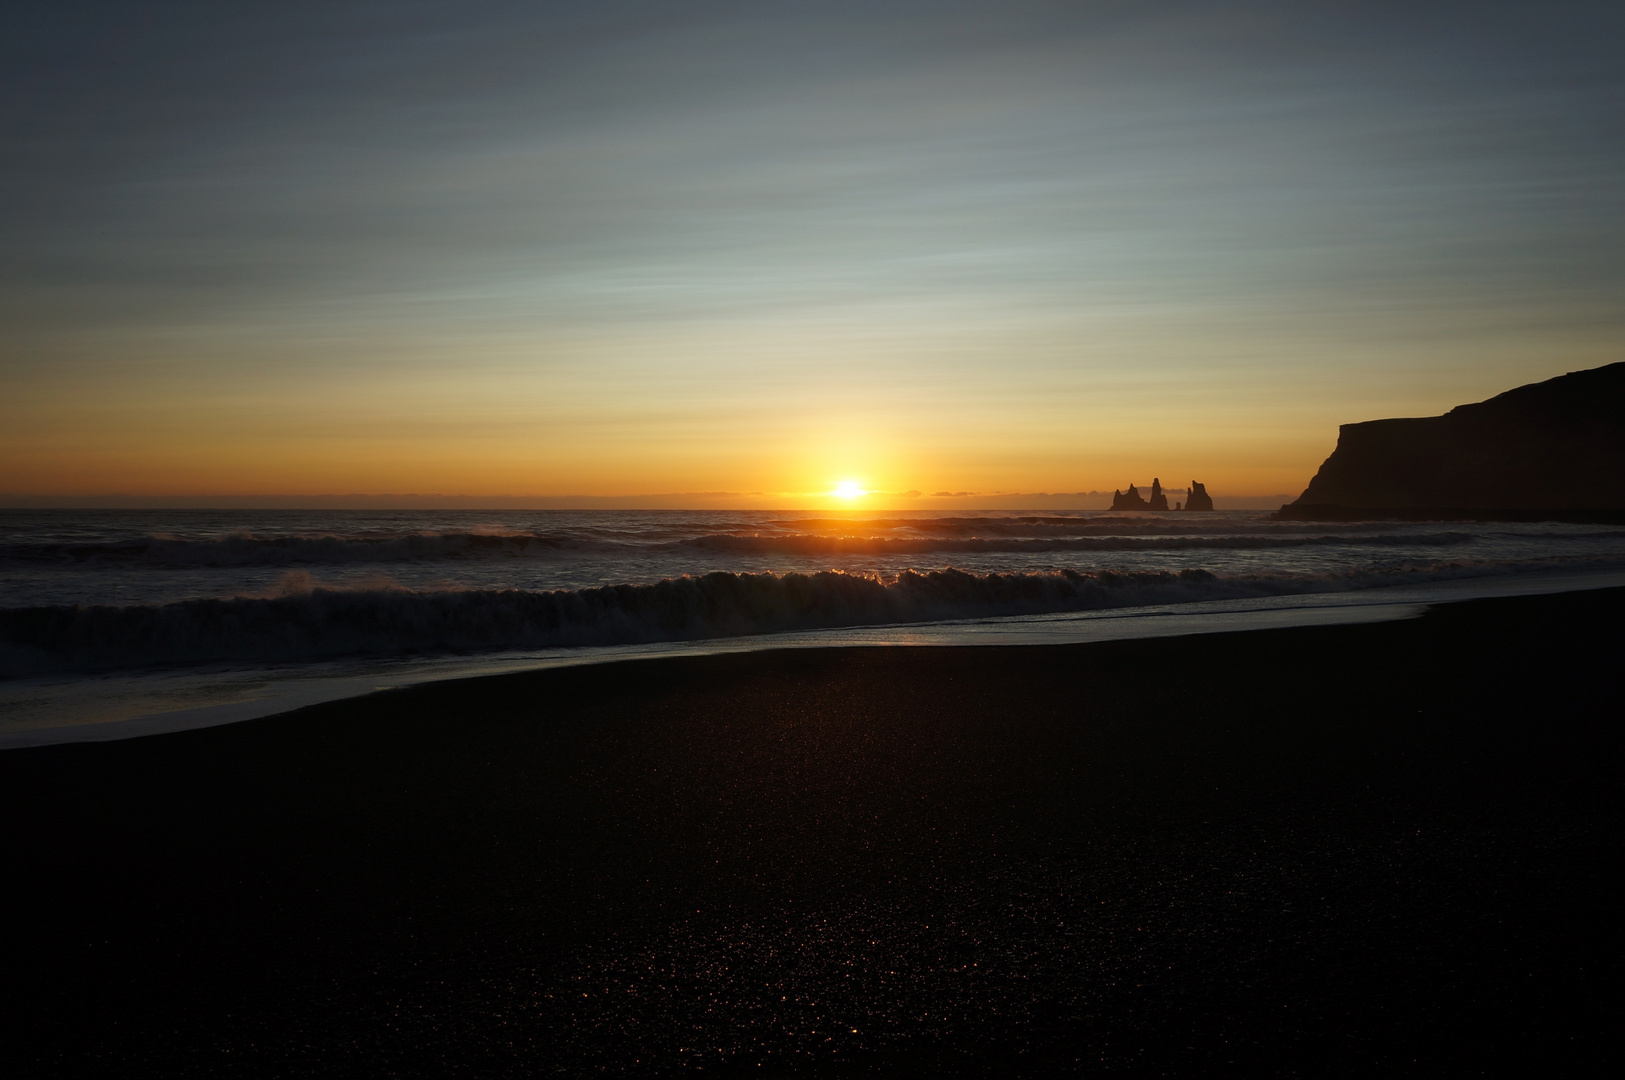 Sonnenuntergang bei Vik (Island 2012)